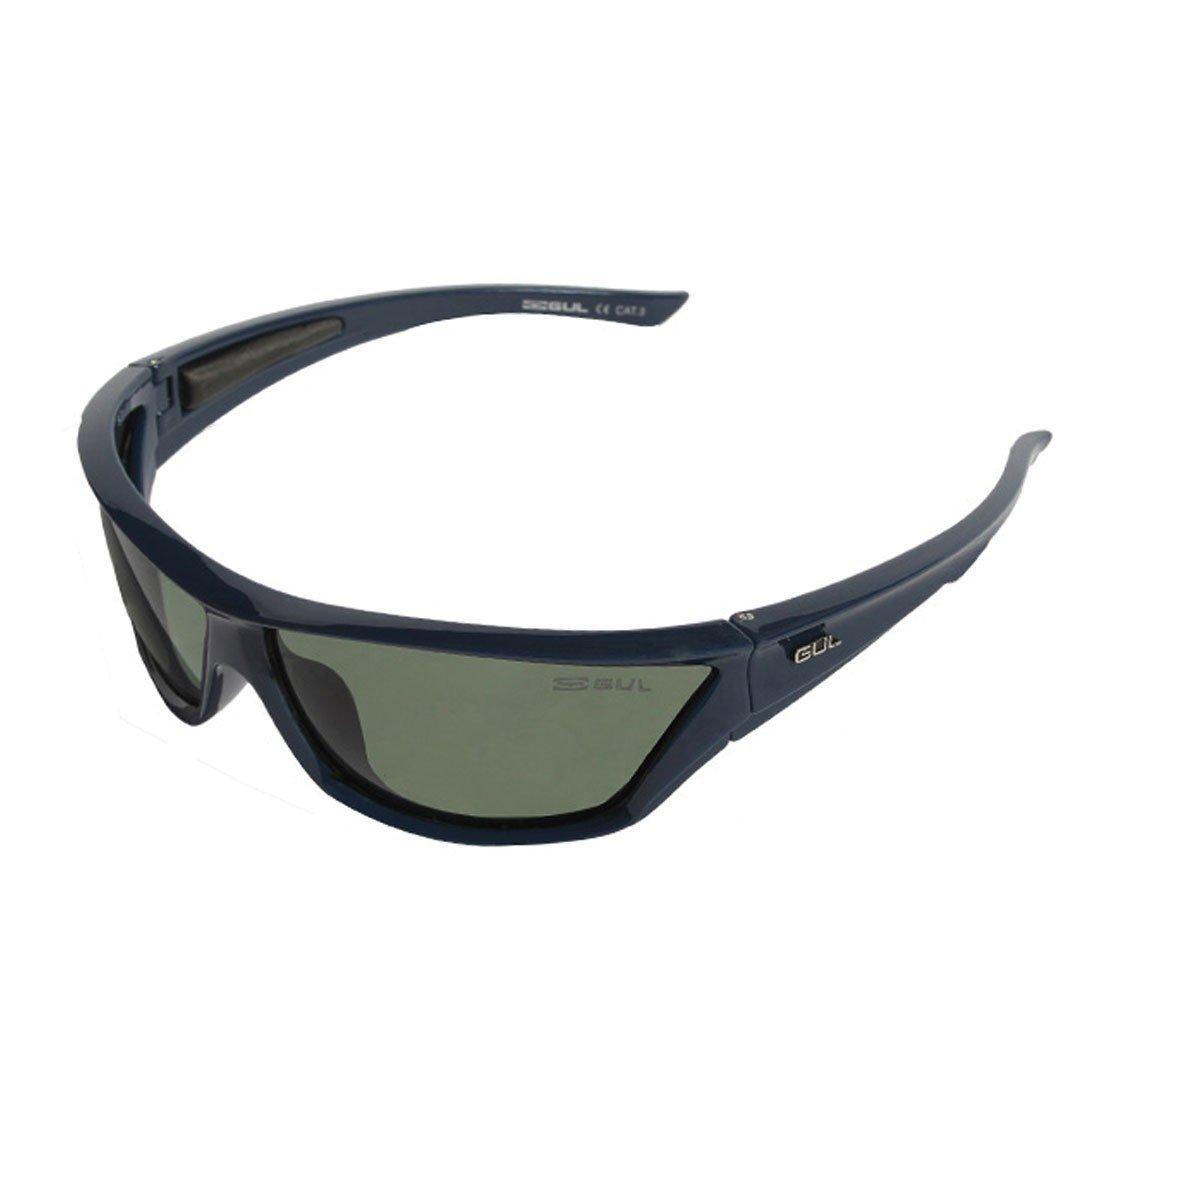 Gul Code Zero React Floating Sunglasses   Sg0003-A3